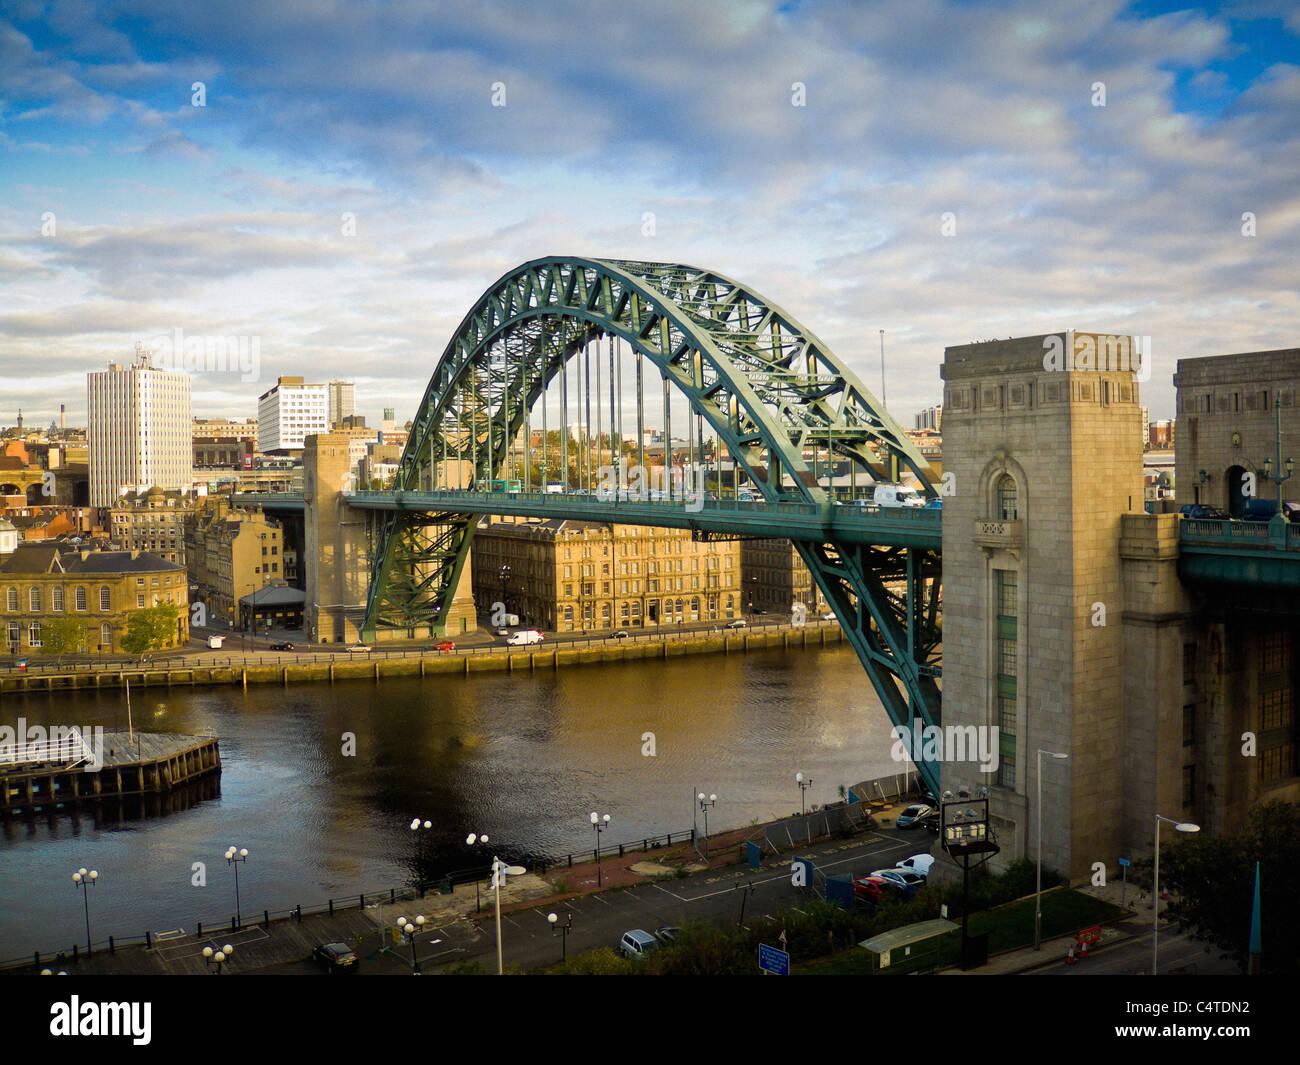 Tyne Bridge spanning the river Tyne to join Gateshead and Newcastle, UK. Stock Photo